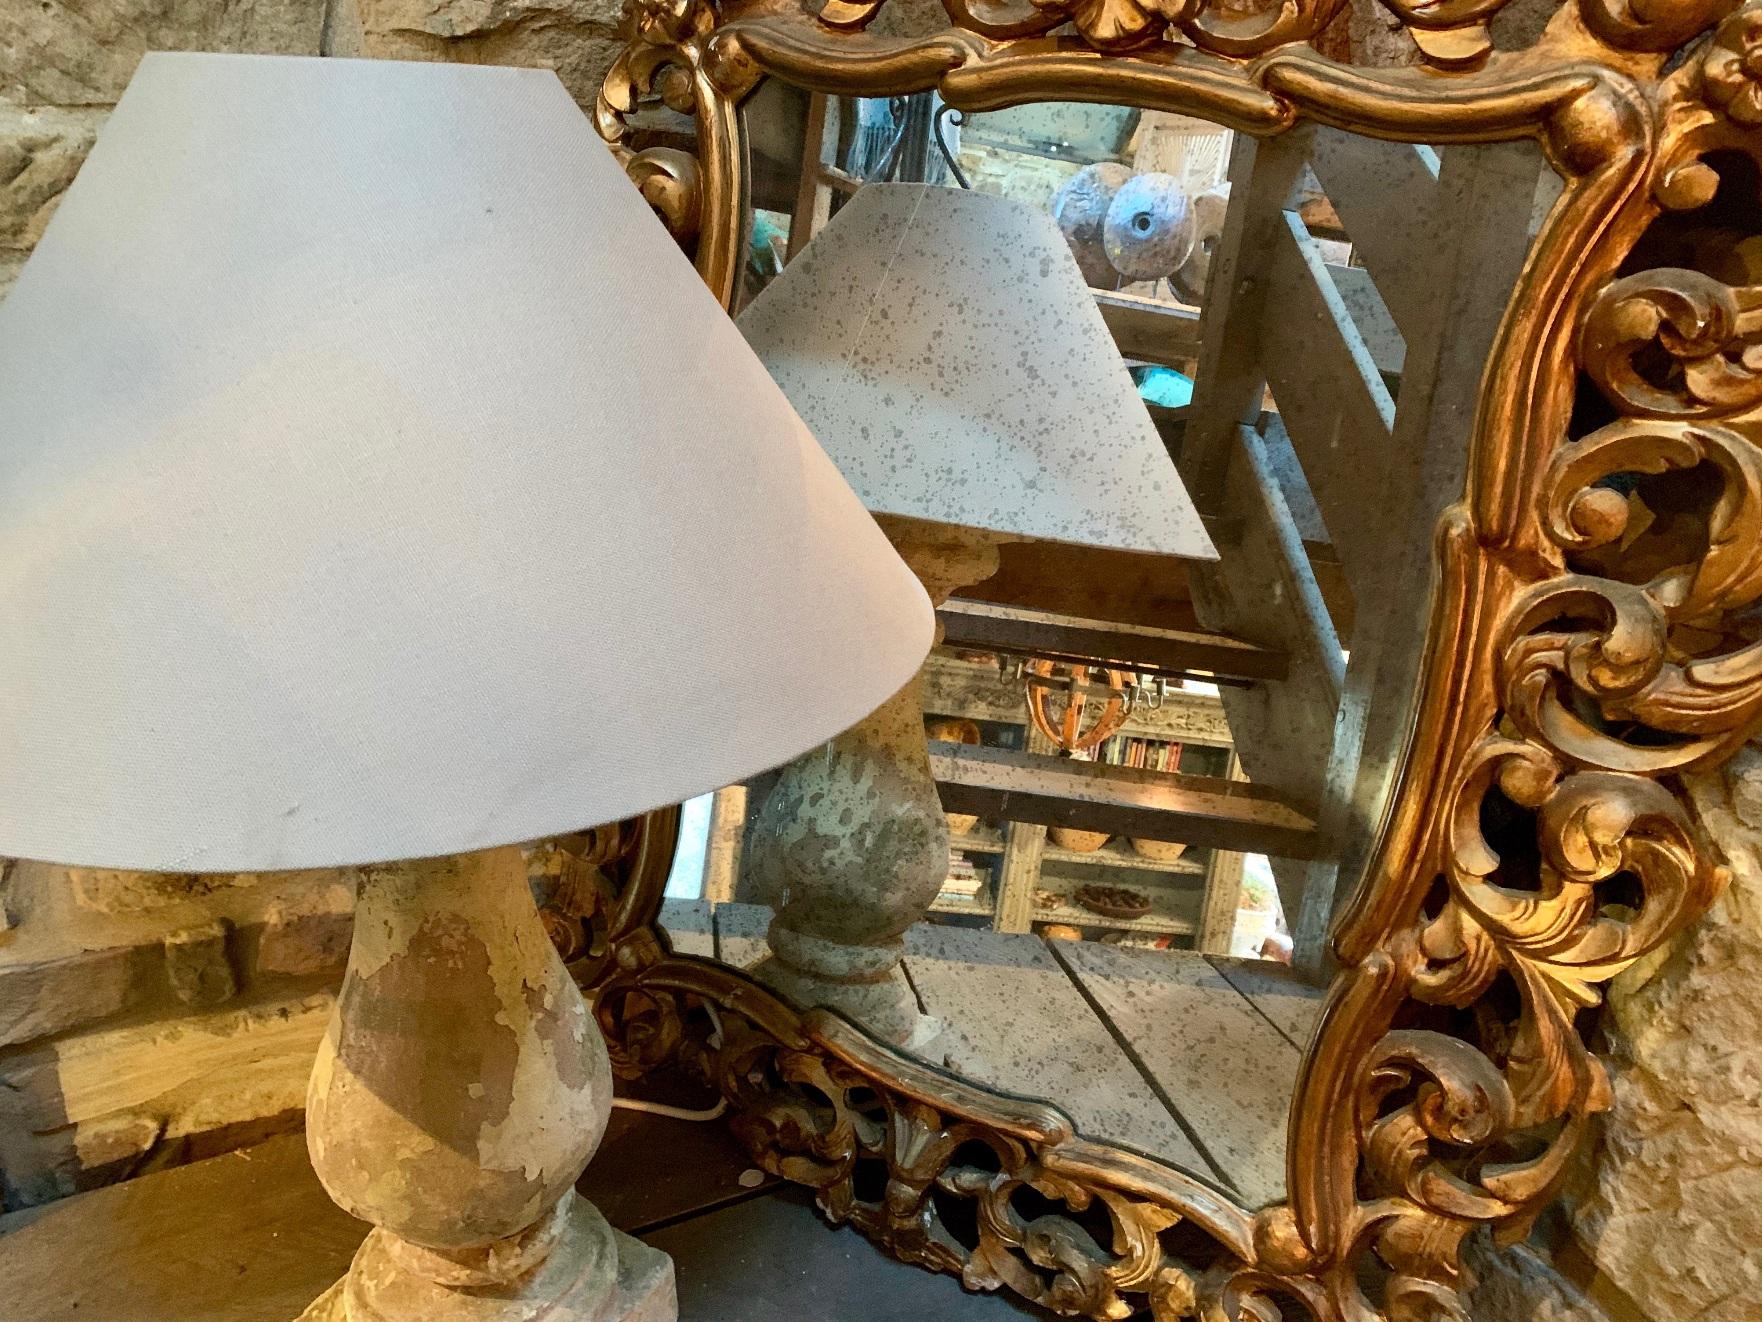 Mirrors & Lighting - Antique & Contemporary MirrorsInterior & Exterior Lighting